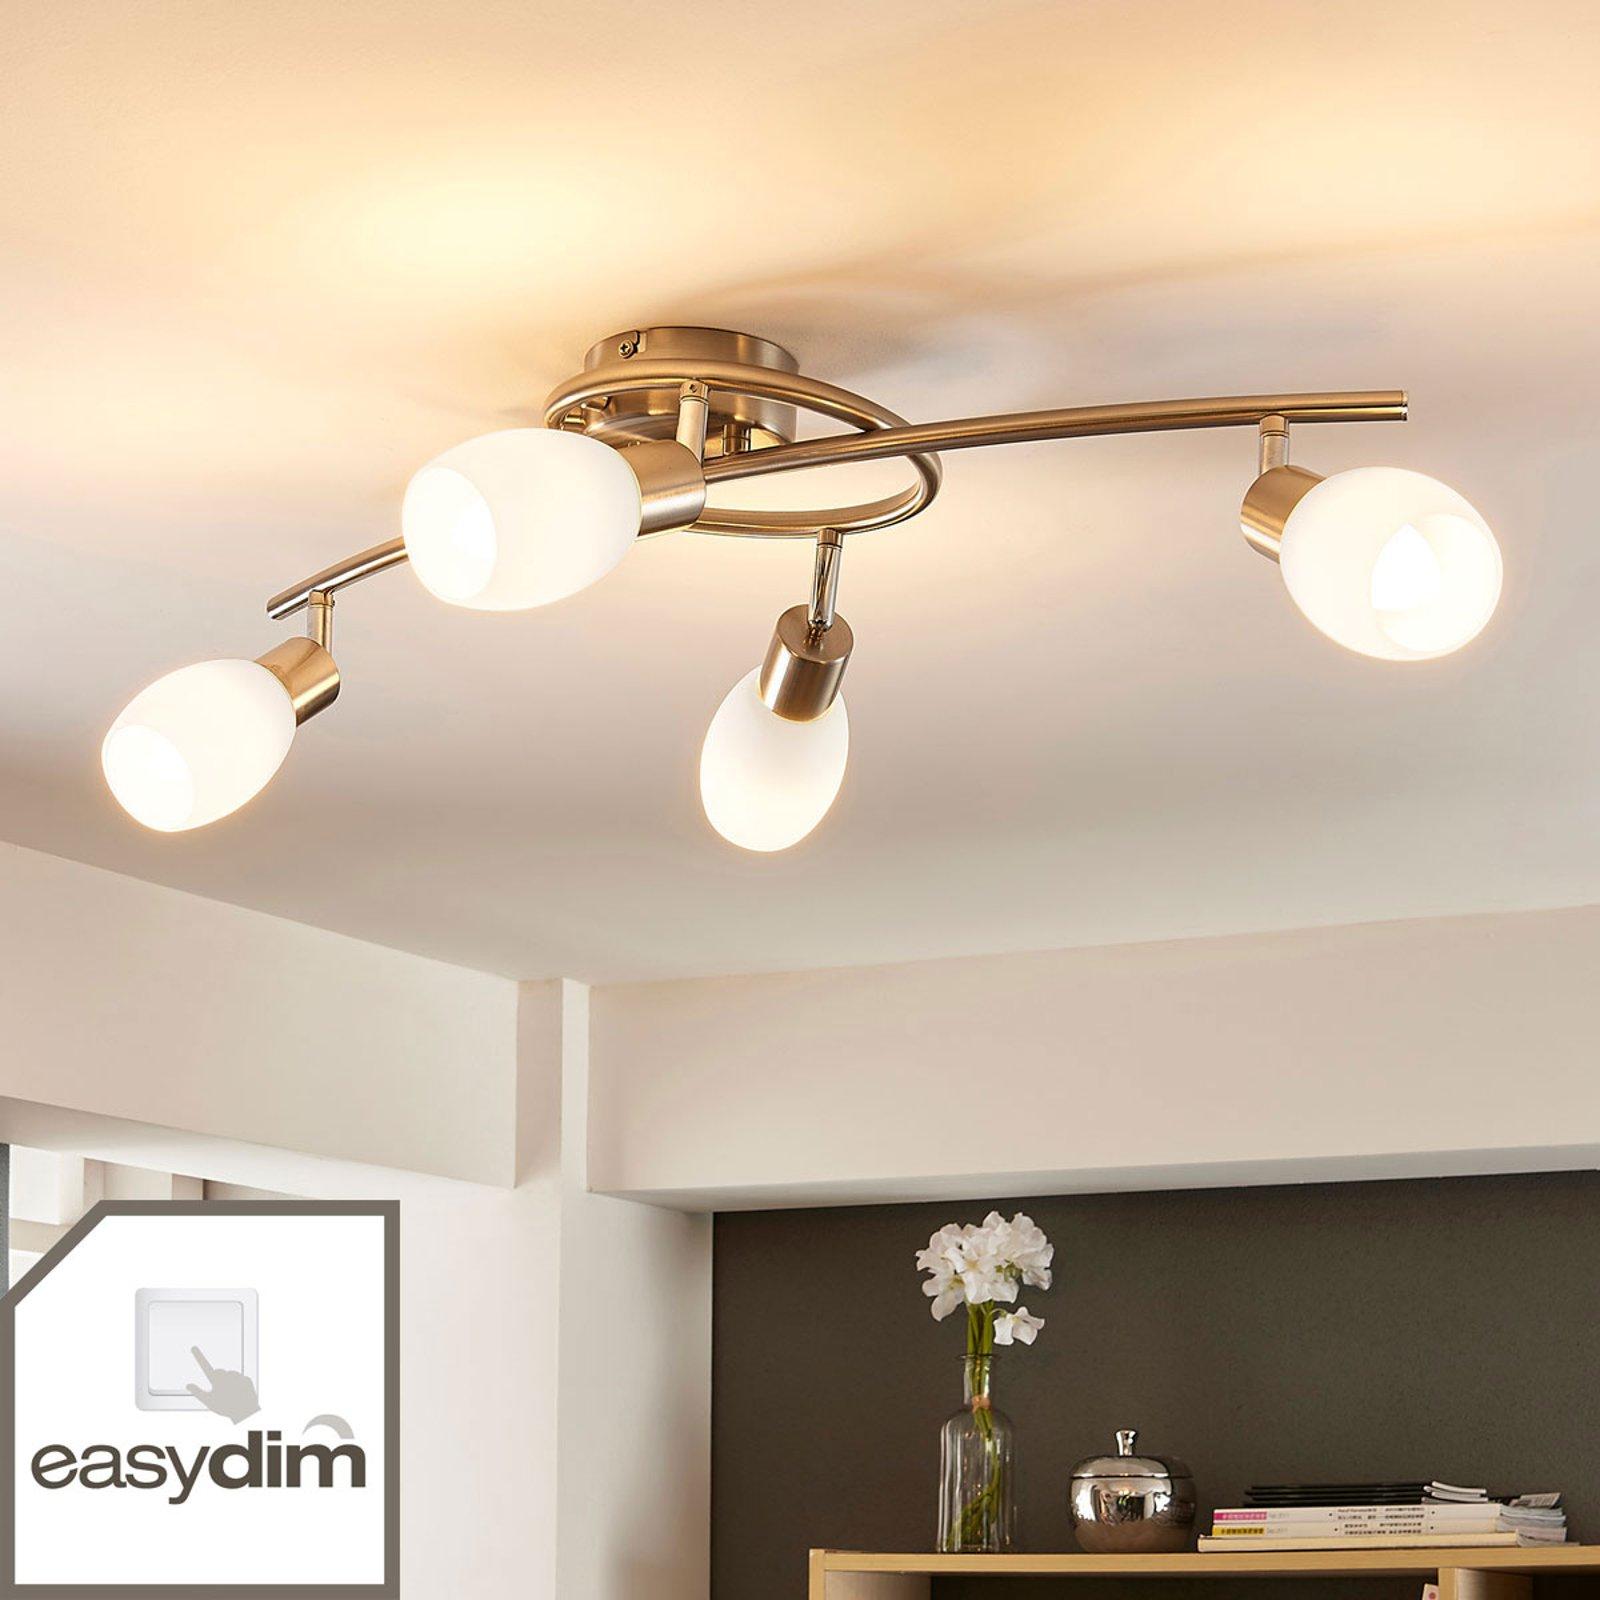 LED-taklampe Arda, dimbar med bryter